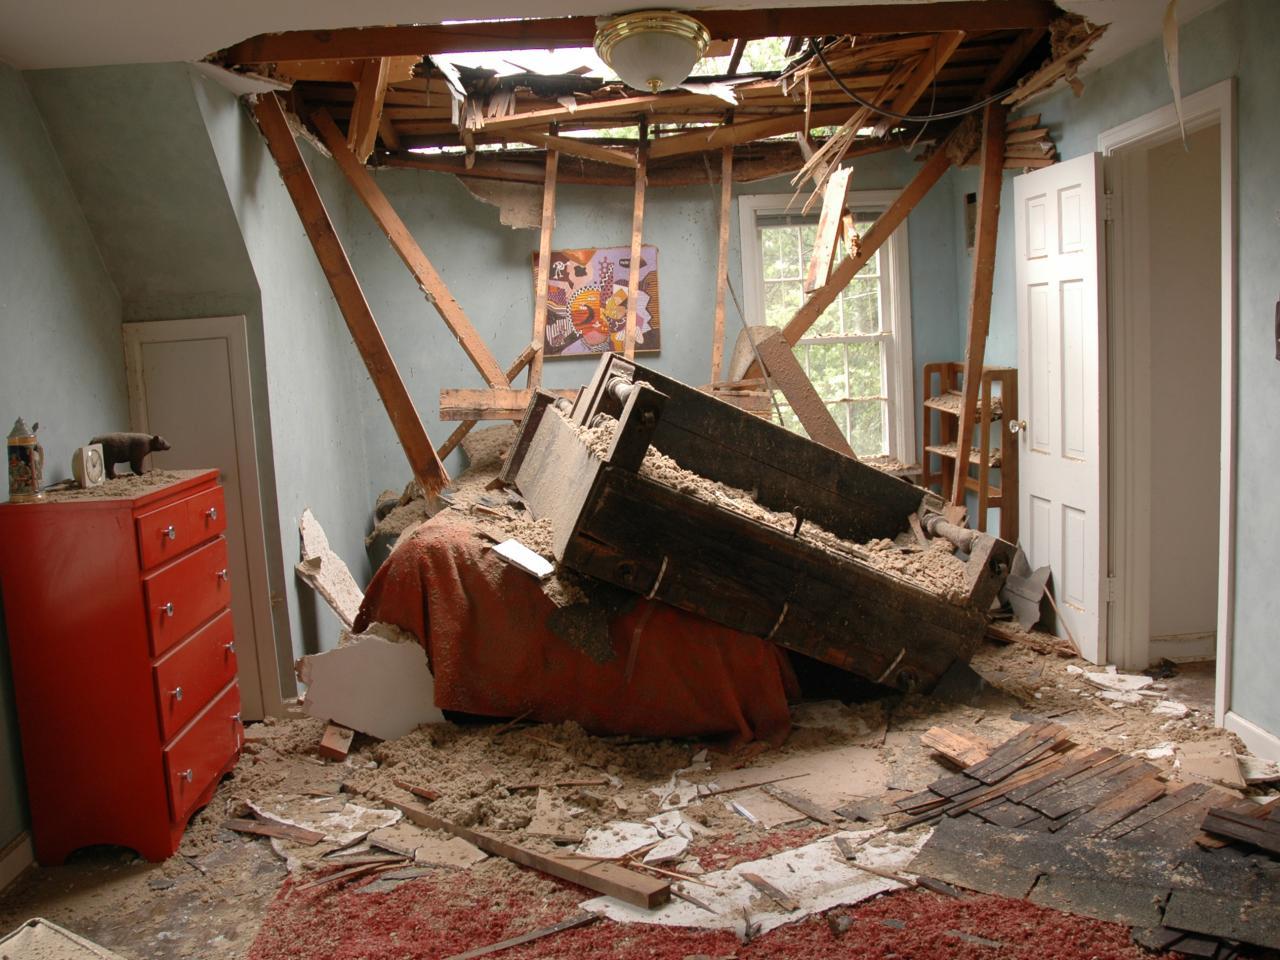 Car interior roof repair - Ddhs101_piano Crashes Through Roof_s4x3